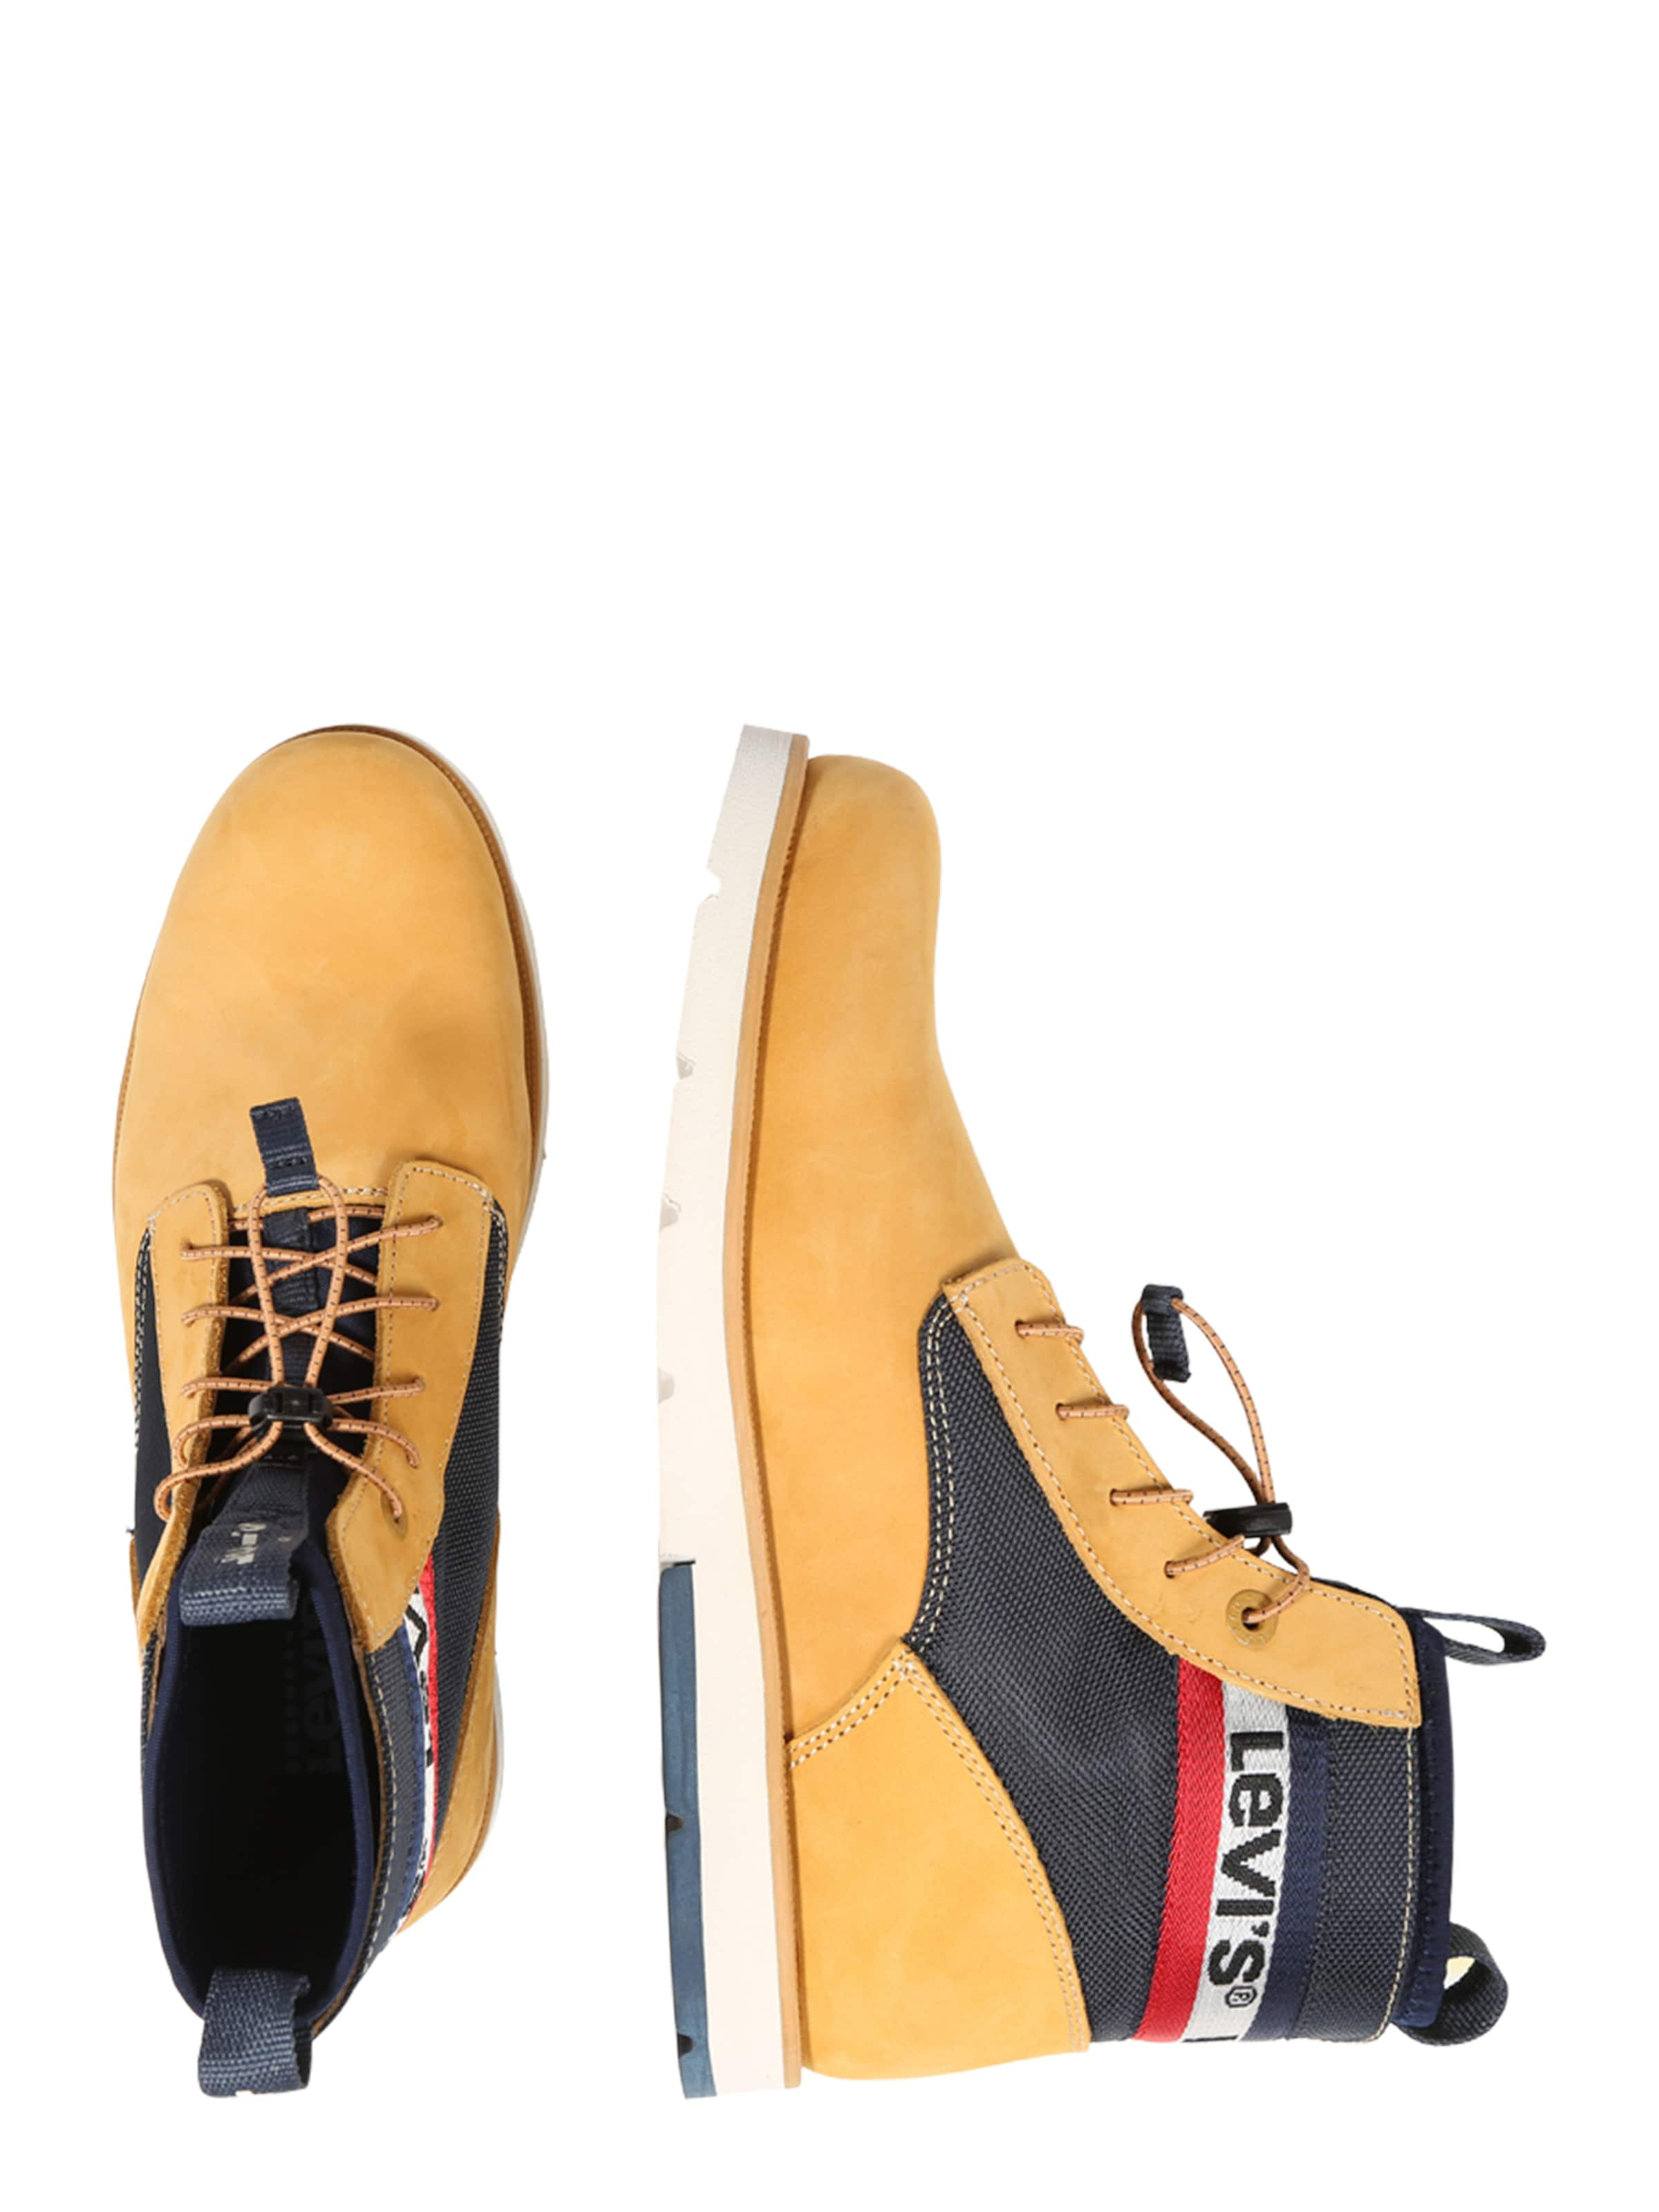 Lite Sportswear' In 'jax Levi's Stiefel HellbeigeSchwarz Rc5Lq34Aj